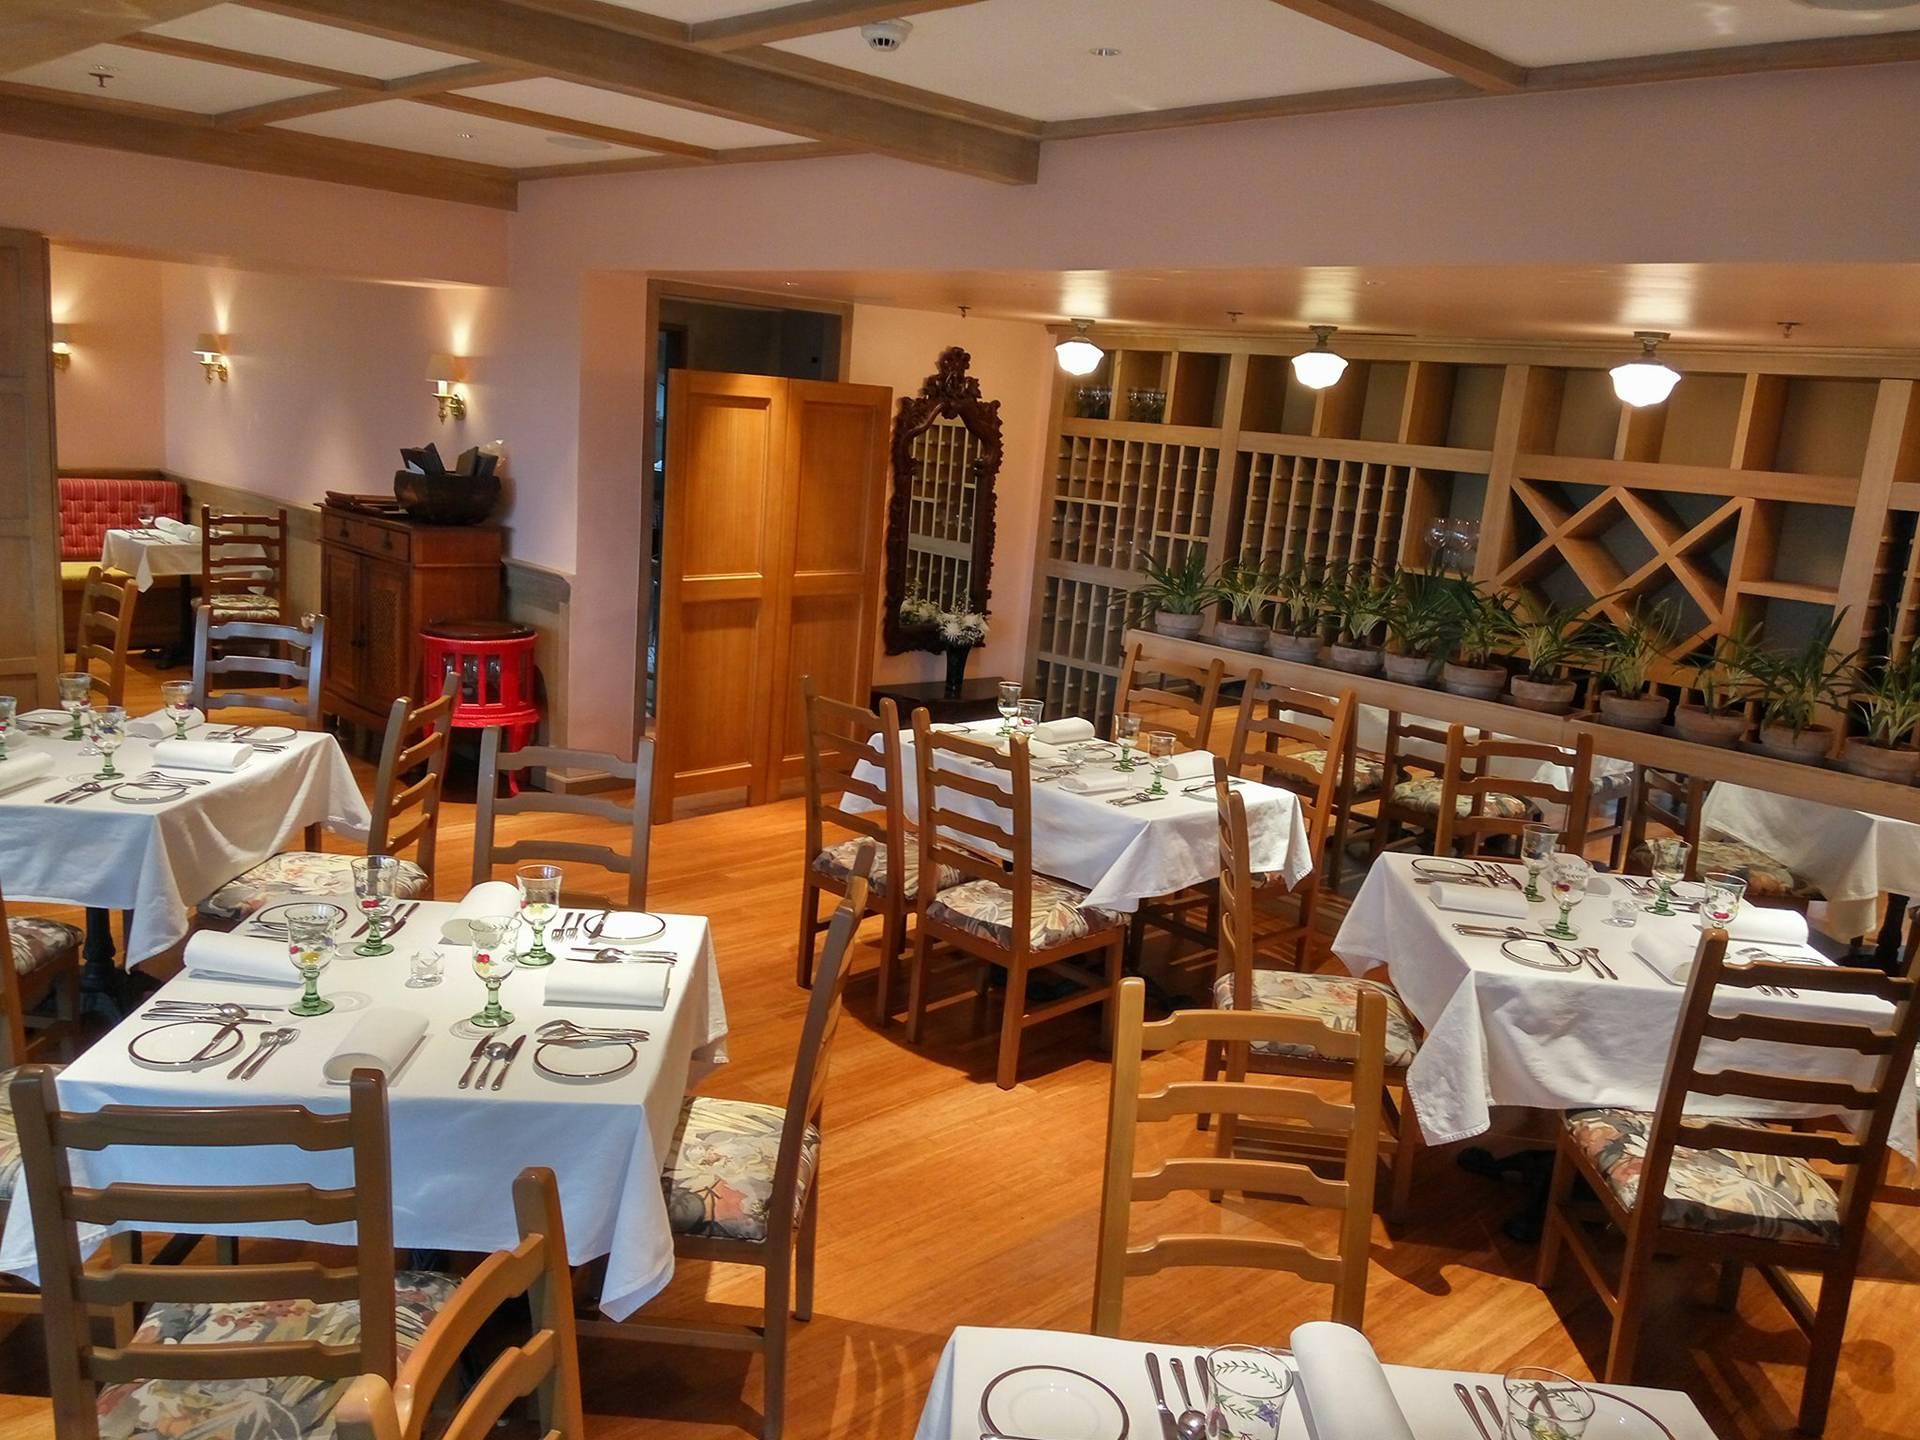 Lemuria Restaurant and Wine Bar, The Plaza at Arya Residences, McKinley Parkway, Bonifacio Global City, Taguig - 1